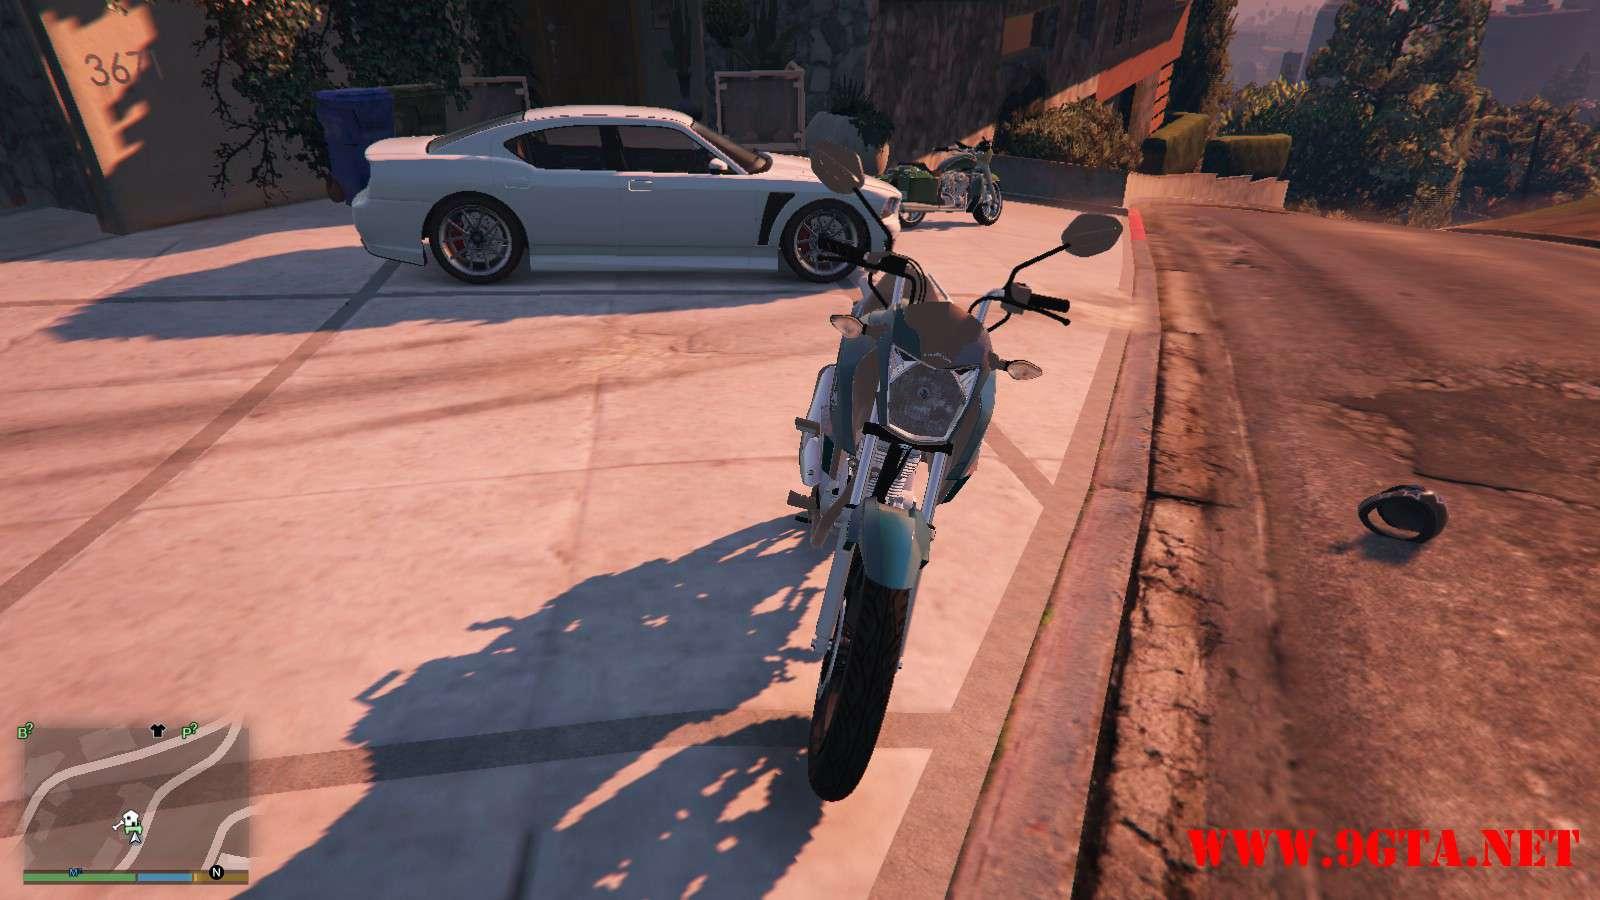 2016 Titan 160 Motocycle GTA5 Mods (9)